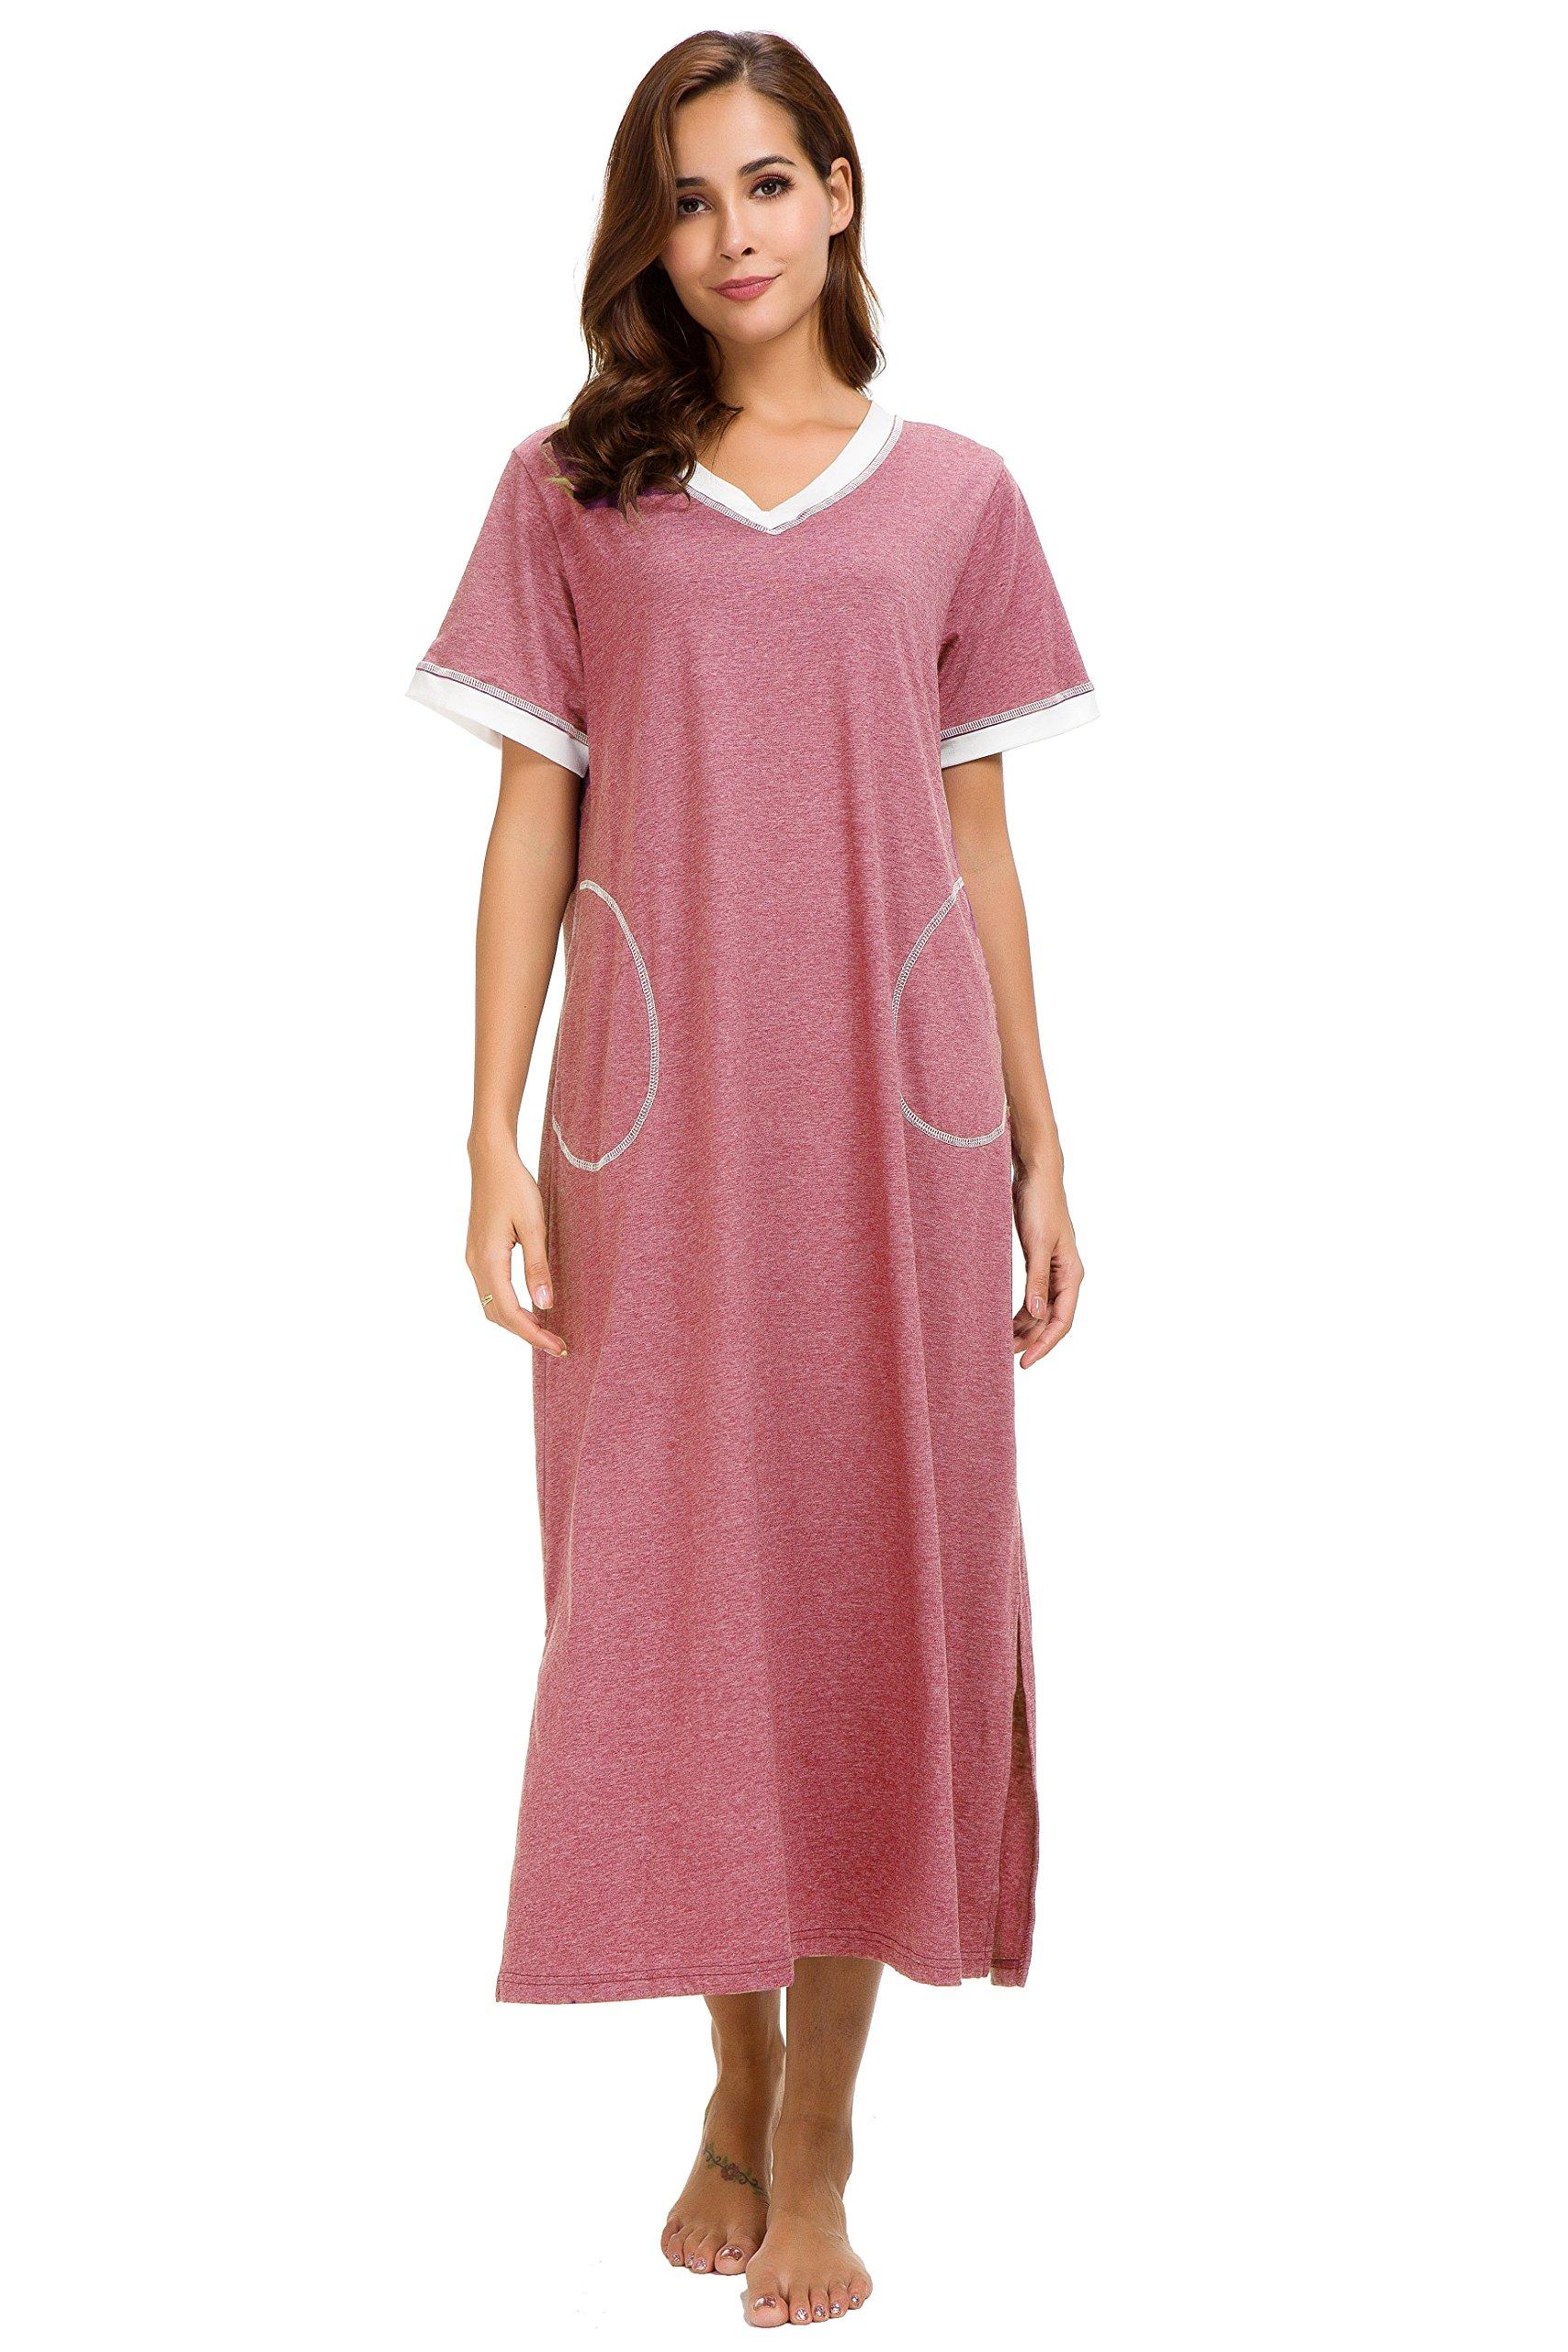 Aviier Supersoft Maxi Sleepshirt with Pockets, Nightgowns for Women Short Sleeve Cotton Nightshirts Sleepwear (XXL, Red) by Aviier (Image #5)